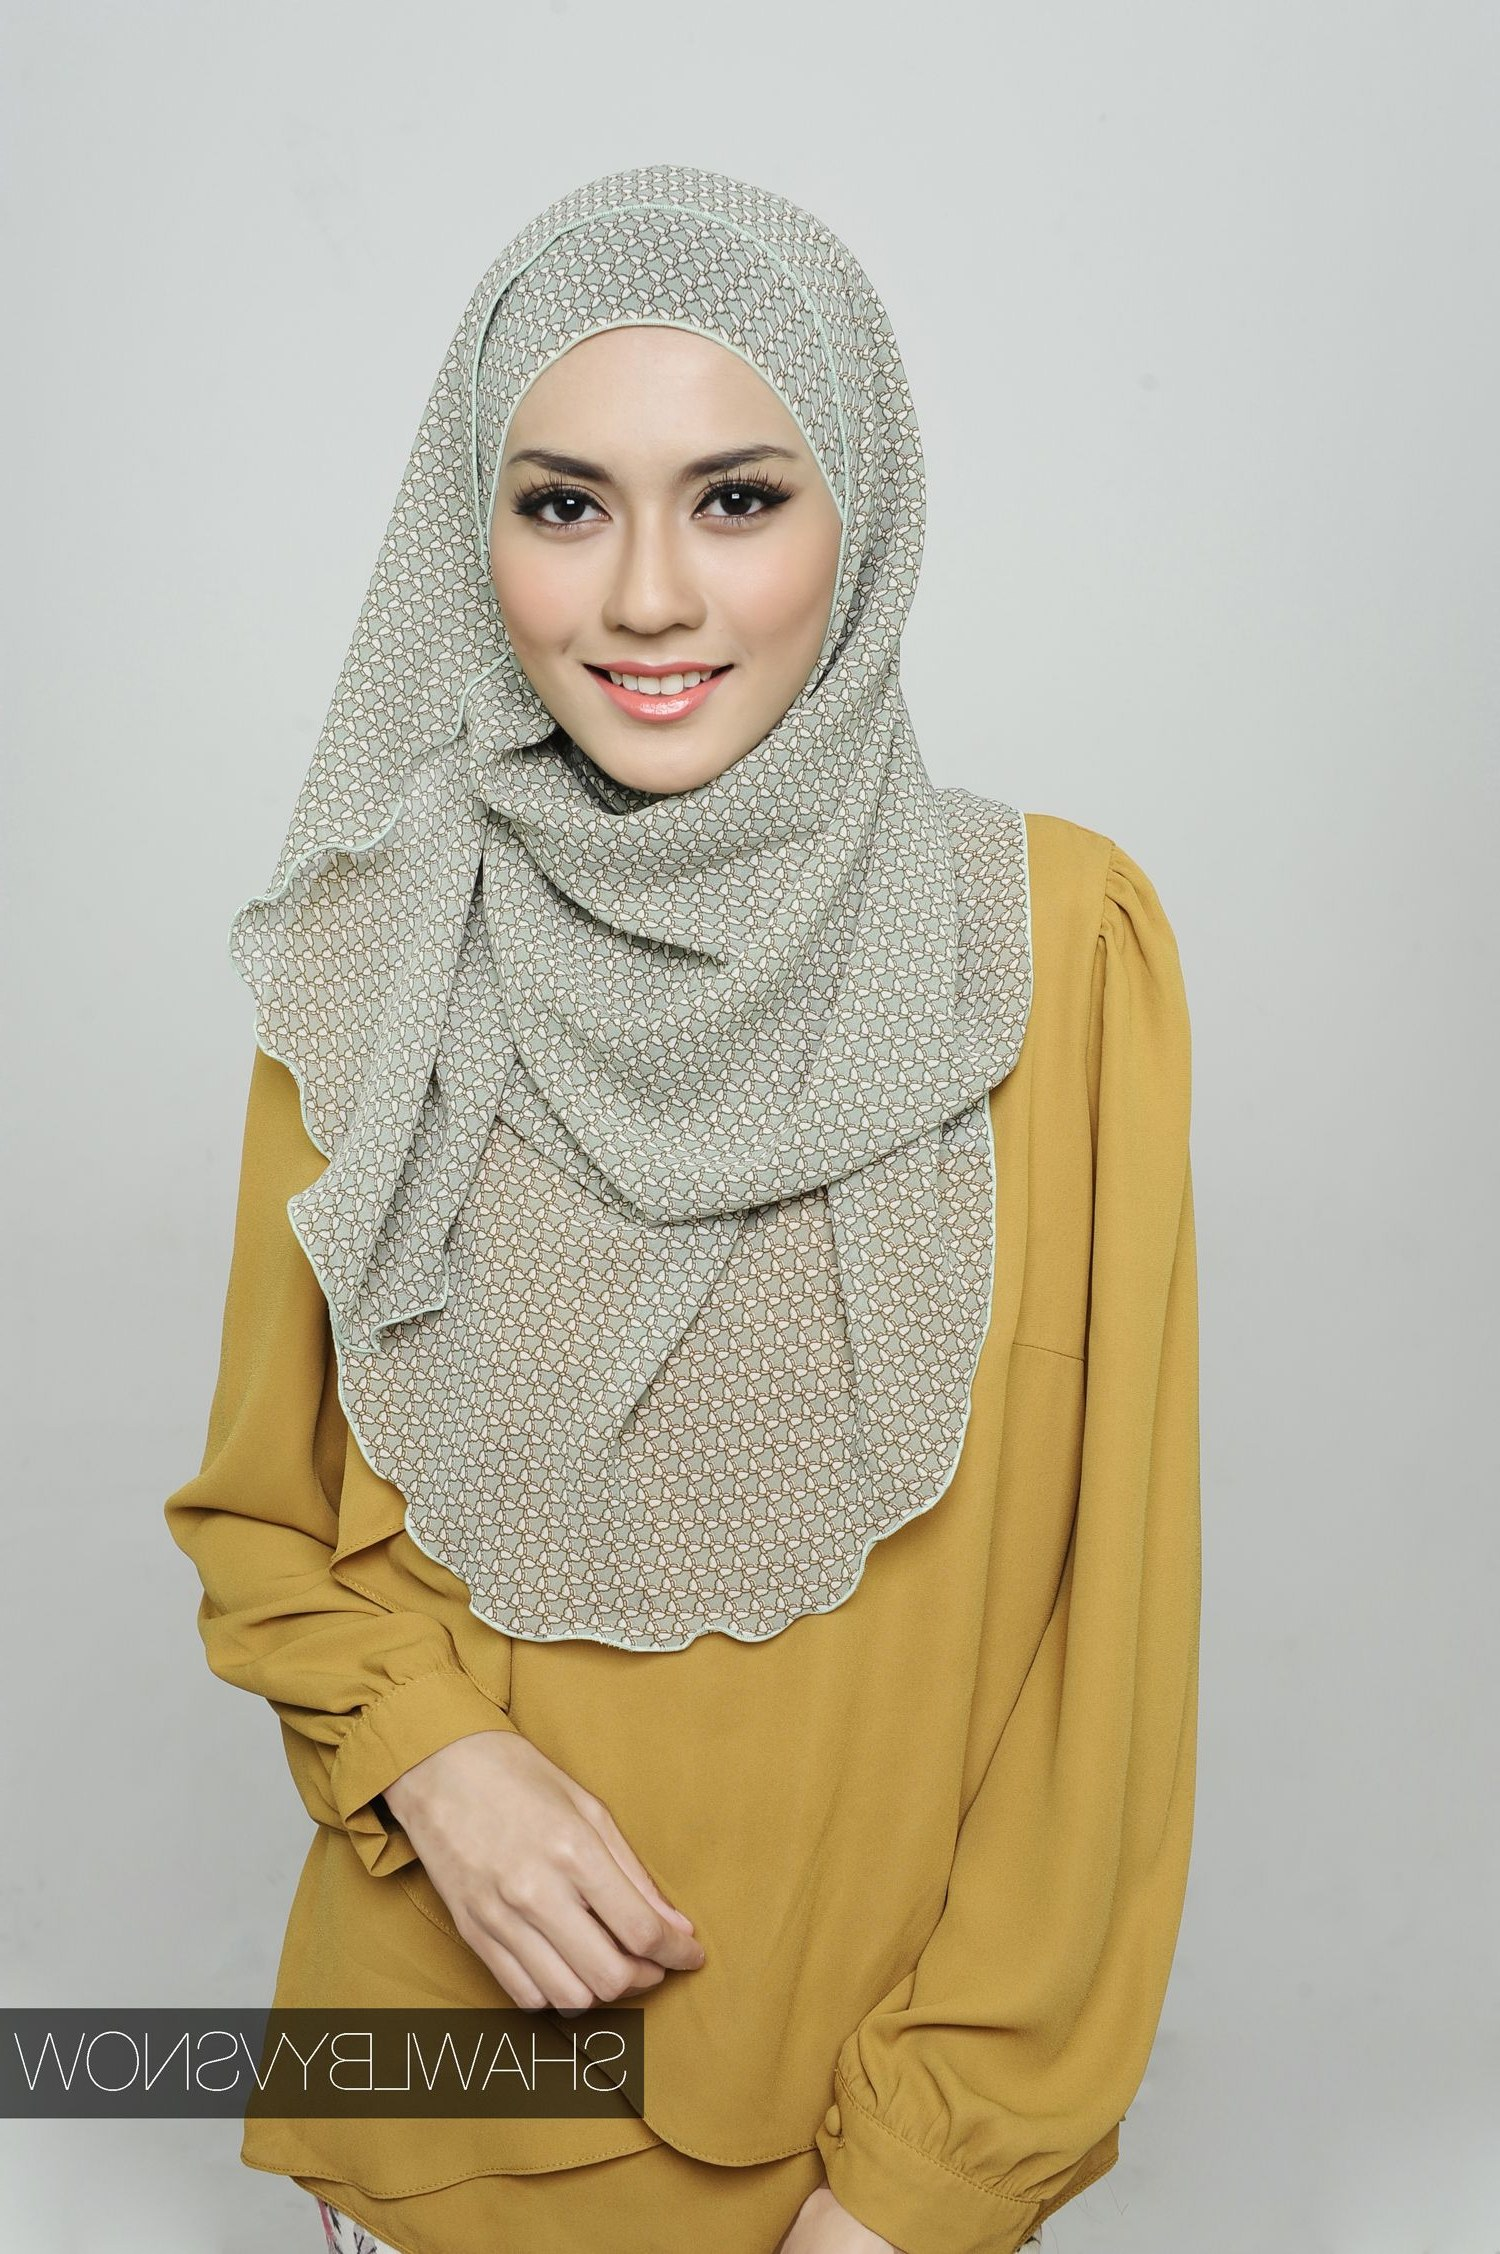 Ide Fashion Muslimah 9fdy Muslimah Fashion Inspiration if Anyone Knows where to